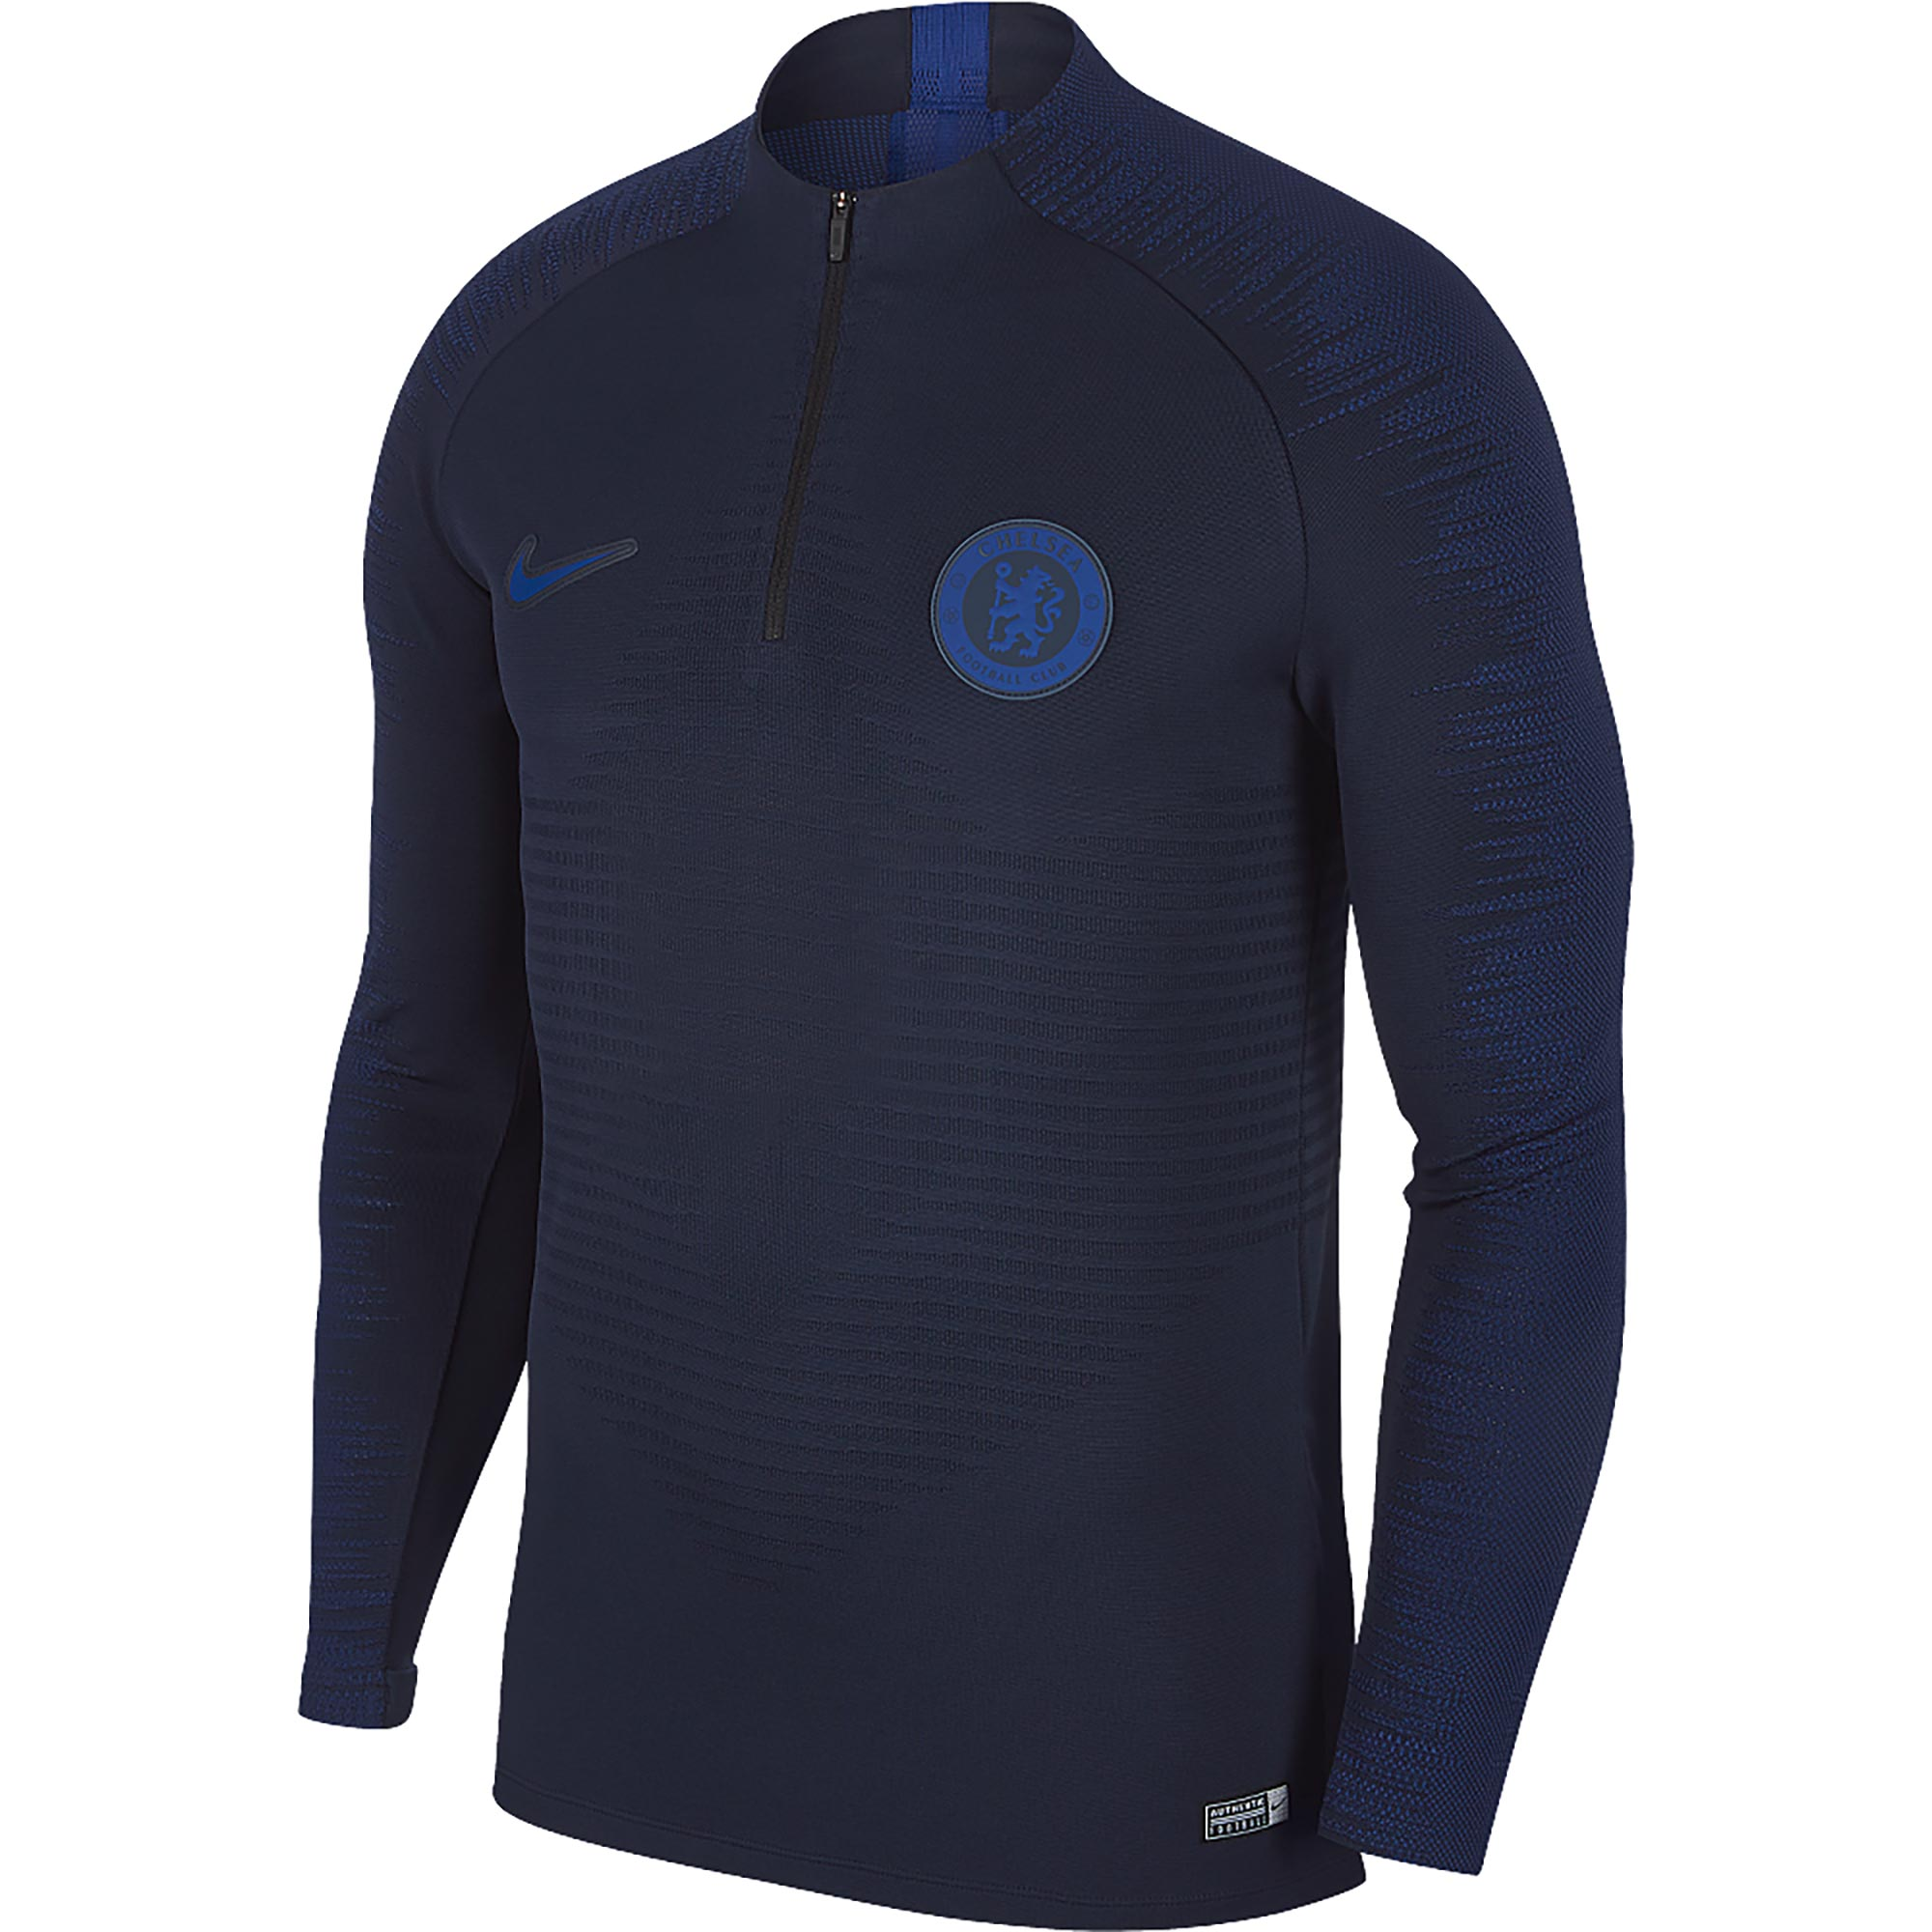 Camiseta Vaporknit Strike Drill del Chelsea en azul marino